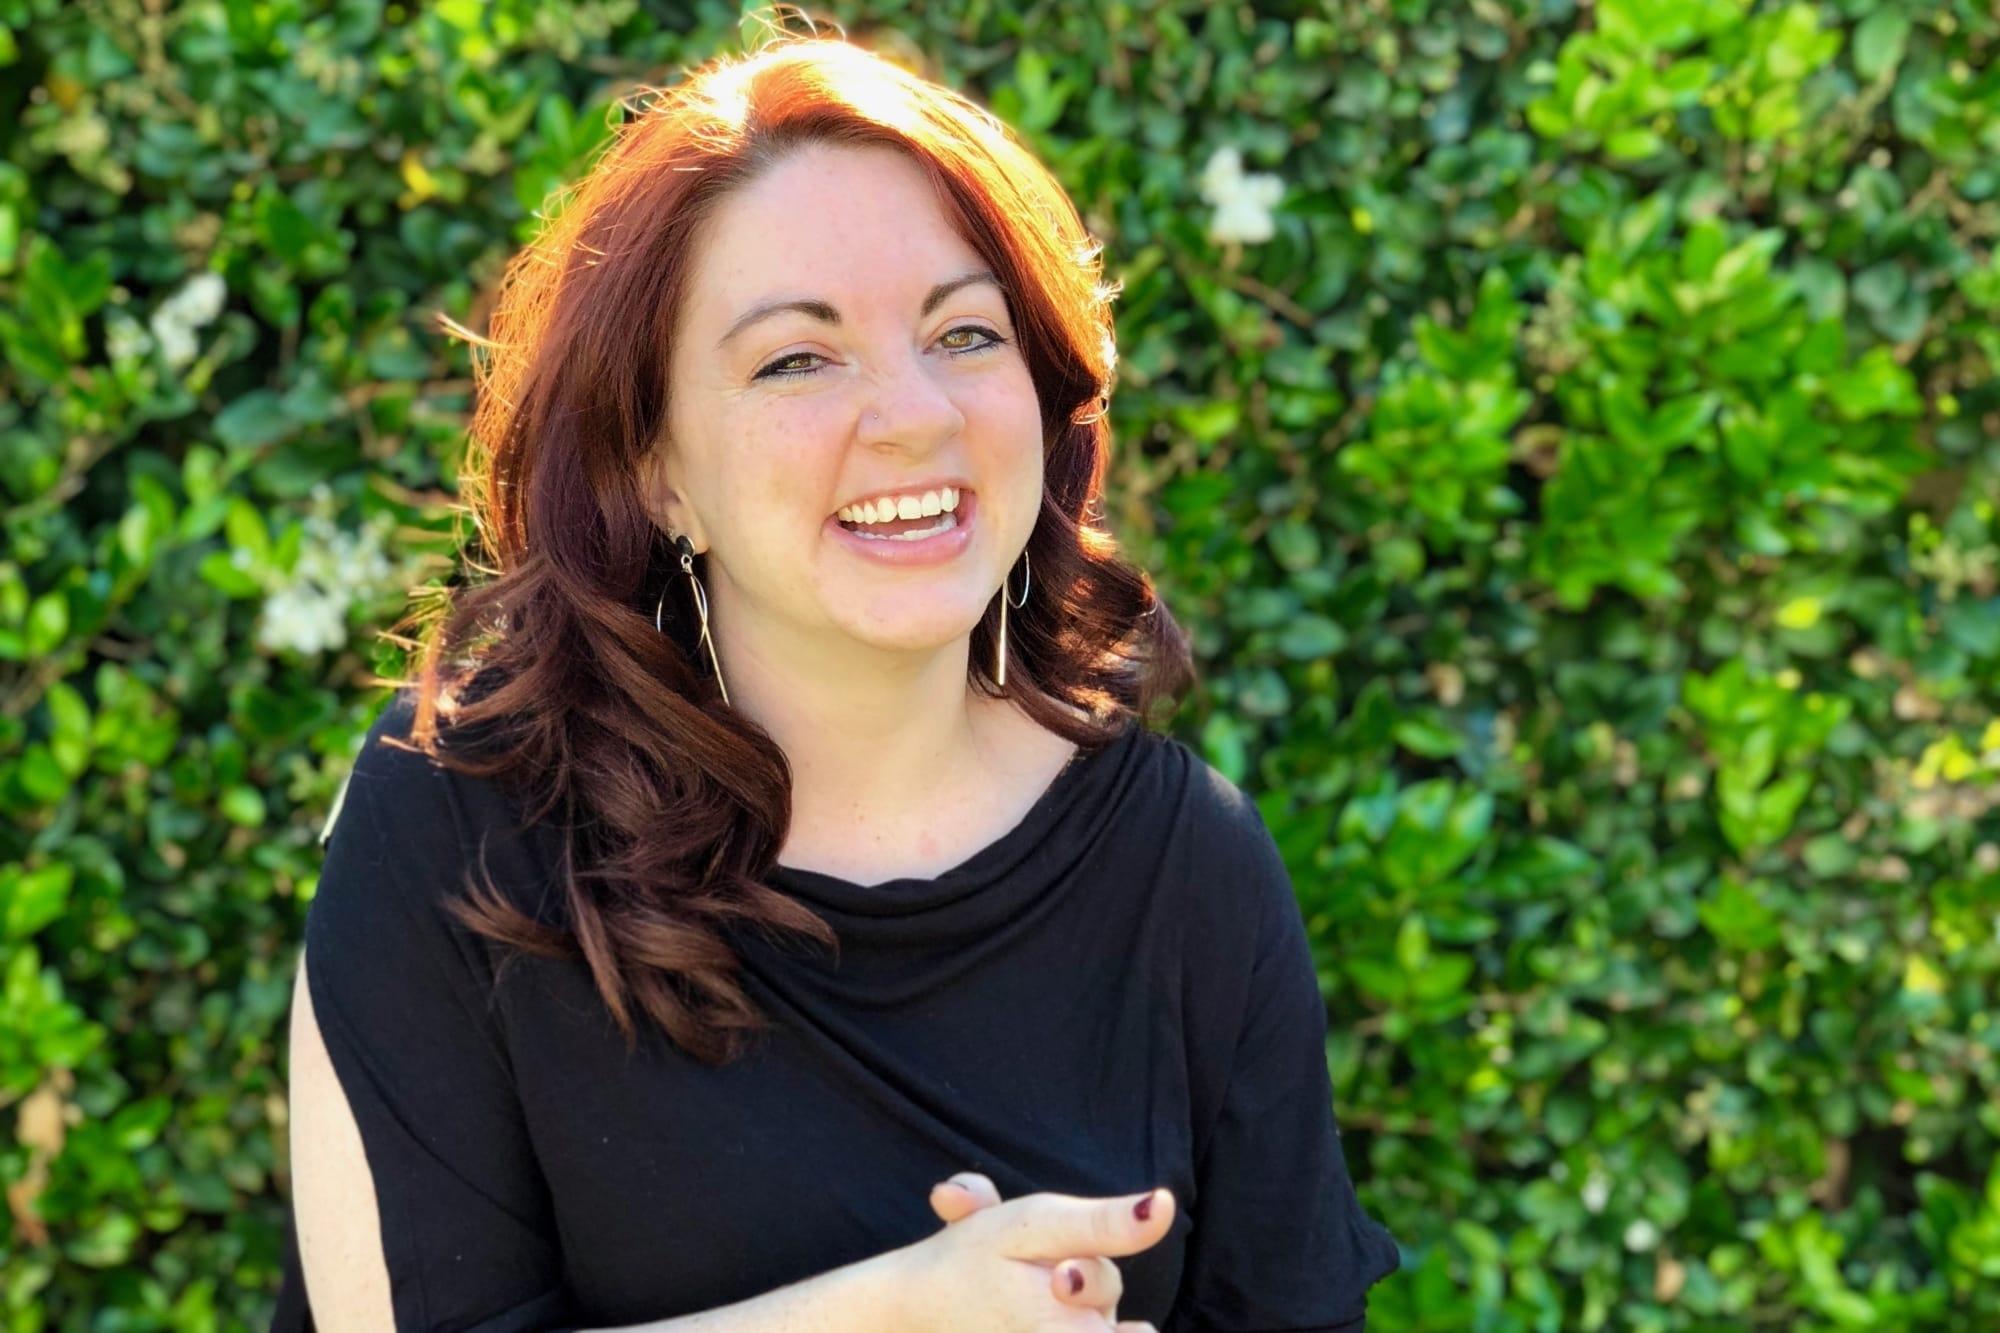 Lynn Renee Maxcy